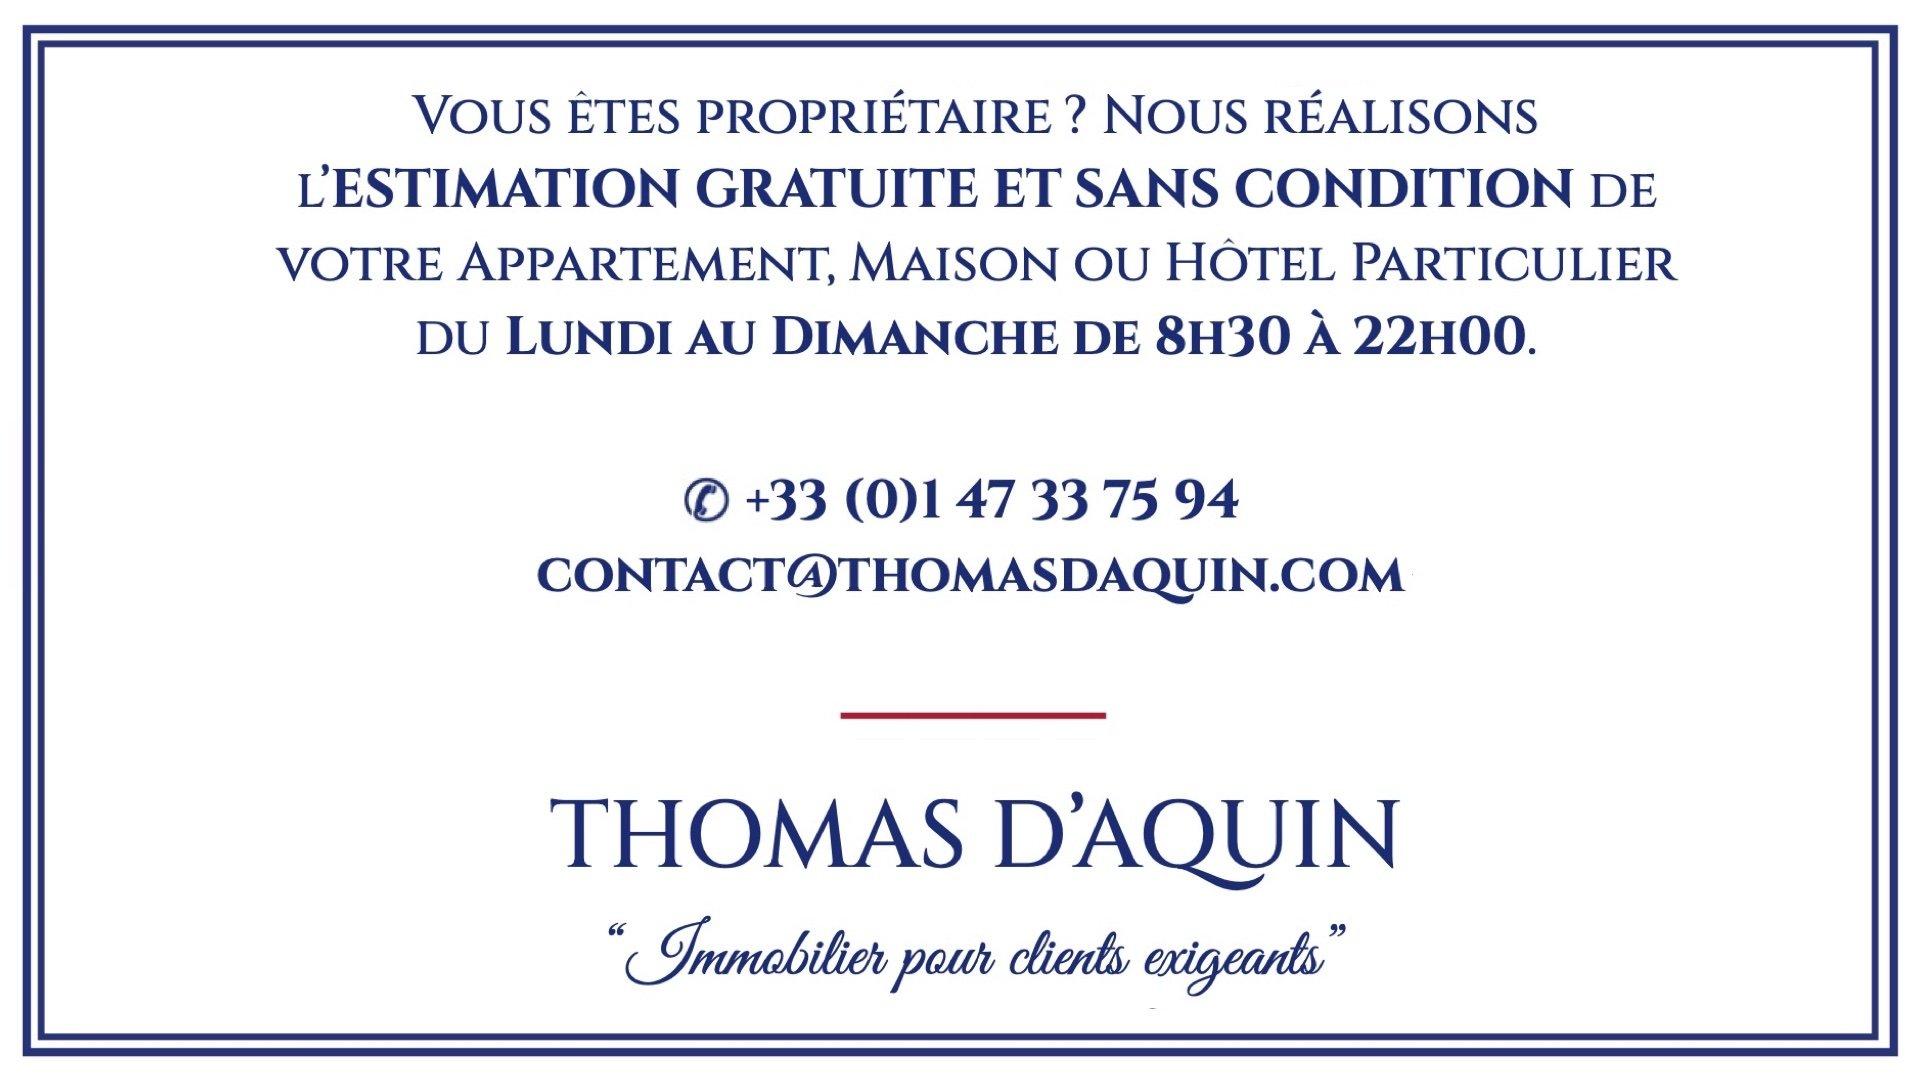 SAINT THOMAS D'AQUIN - CARRÉ RIVE GAUCHE